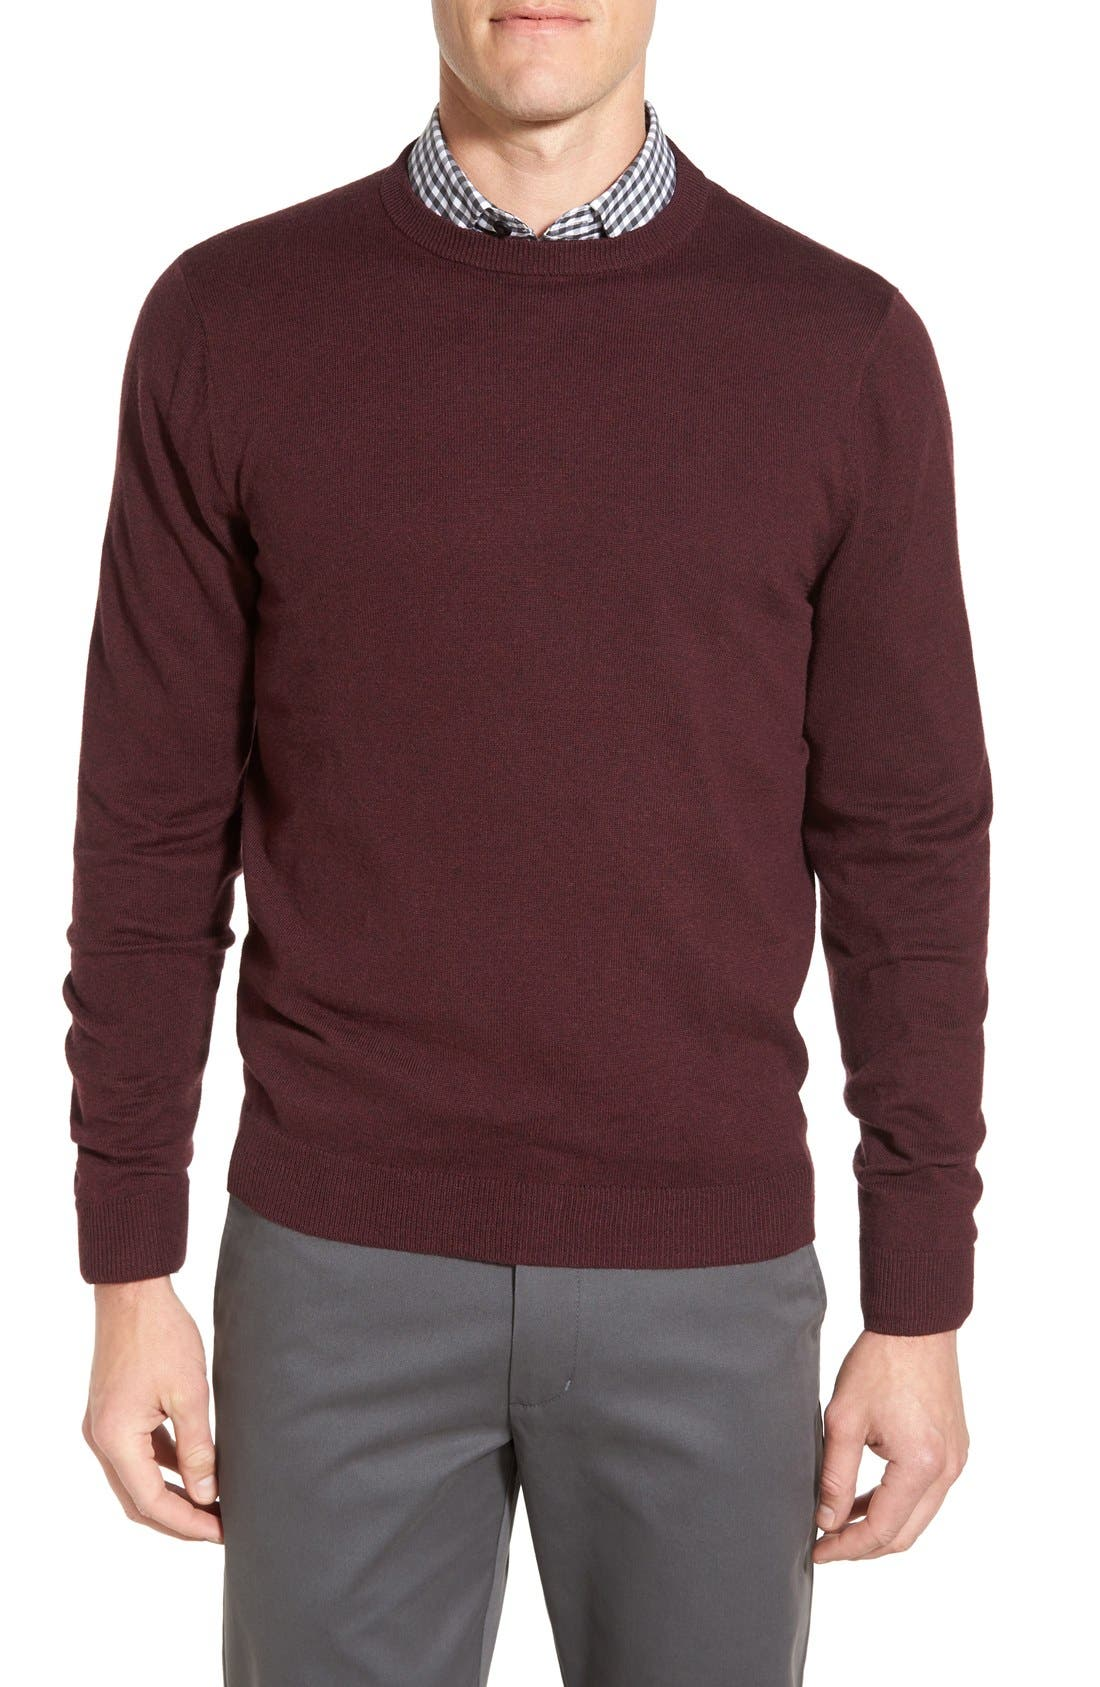 Alternate Image 1 Selected - Nordstrom Men's Shop Cotton & Cashmere Crewneck Sweater (Regular & Tall)